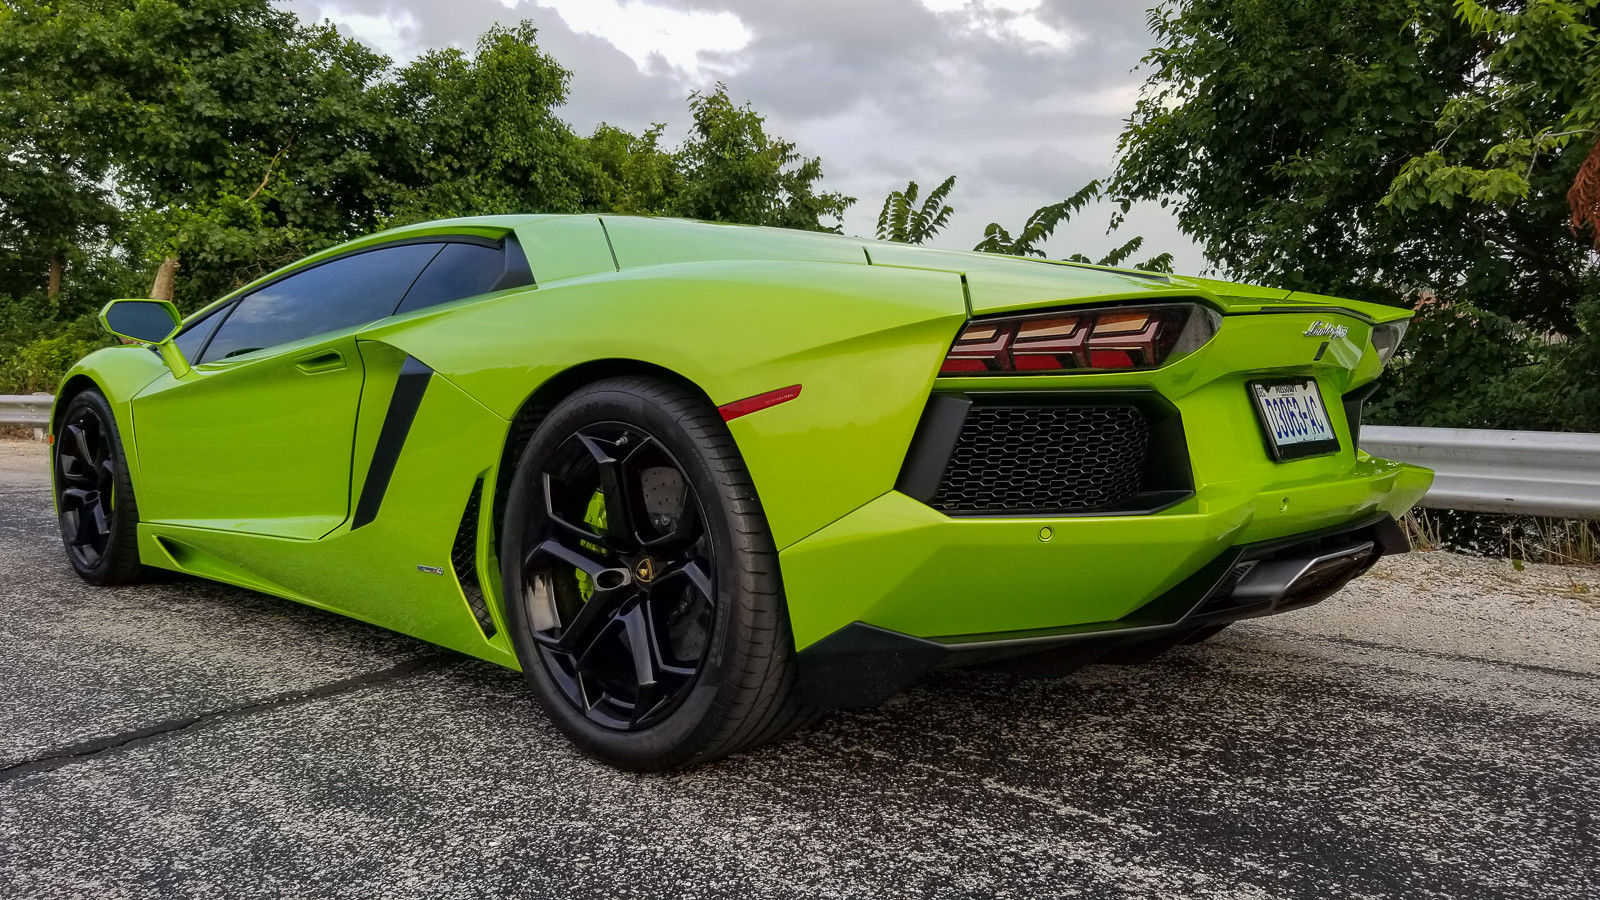 Image Result For  Lamborghini Aventador Msrp